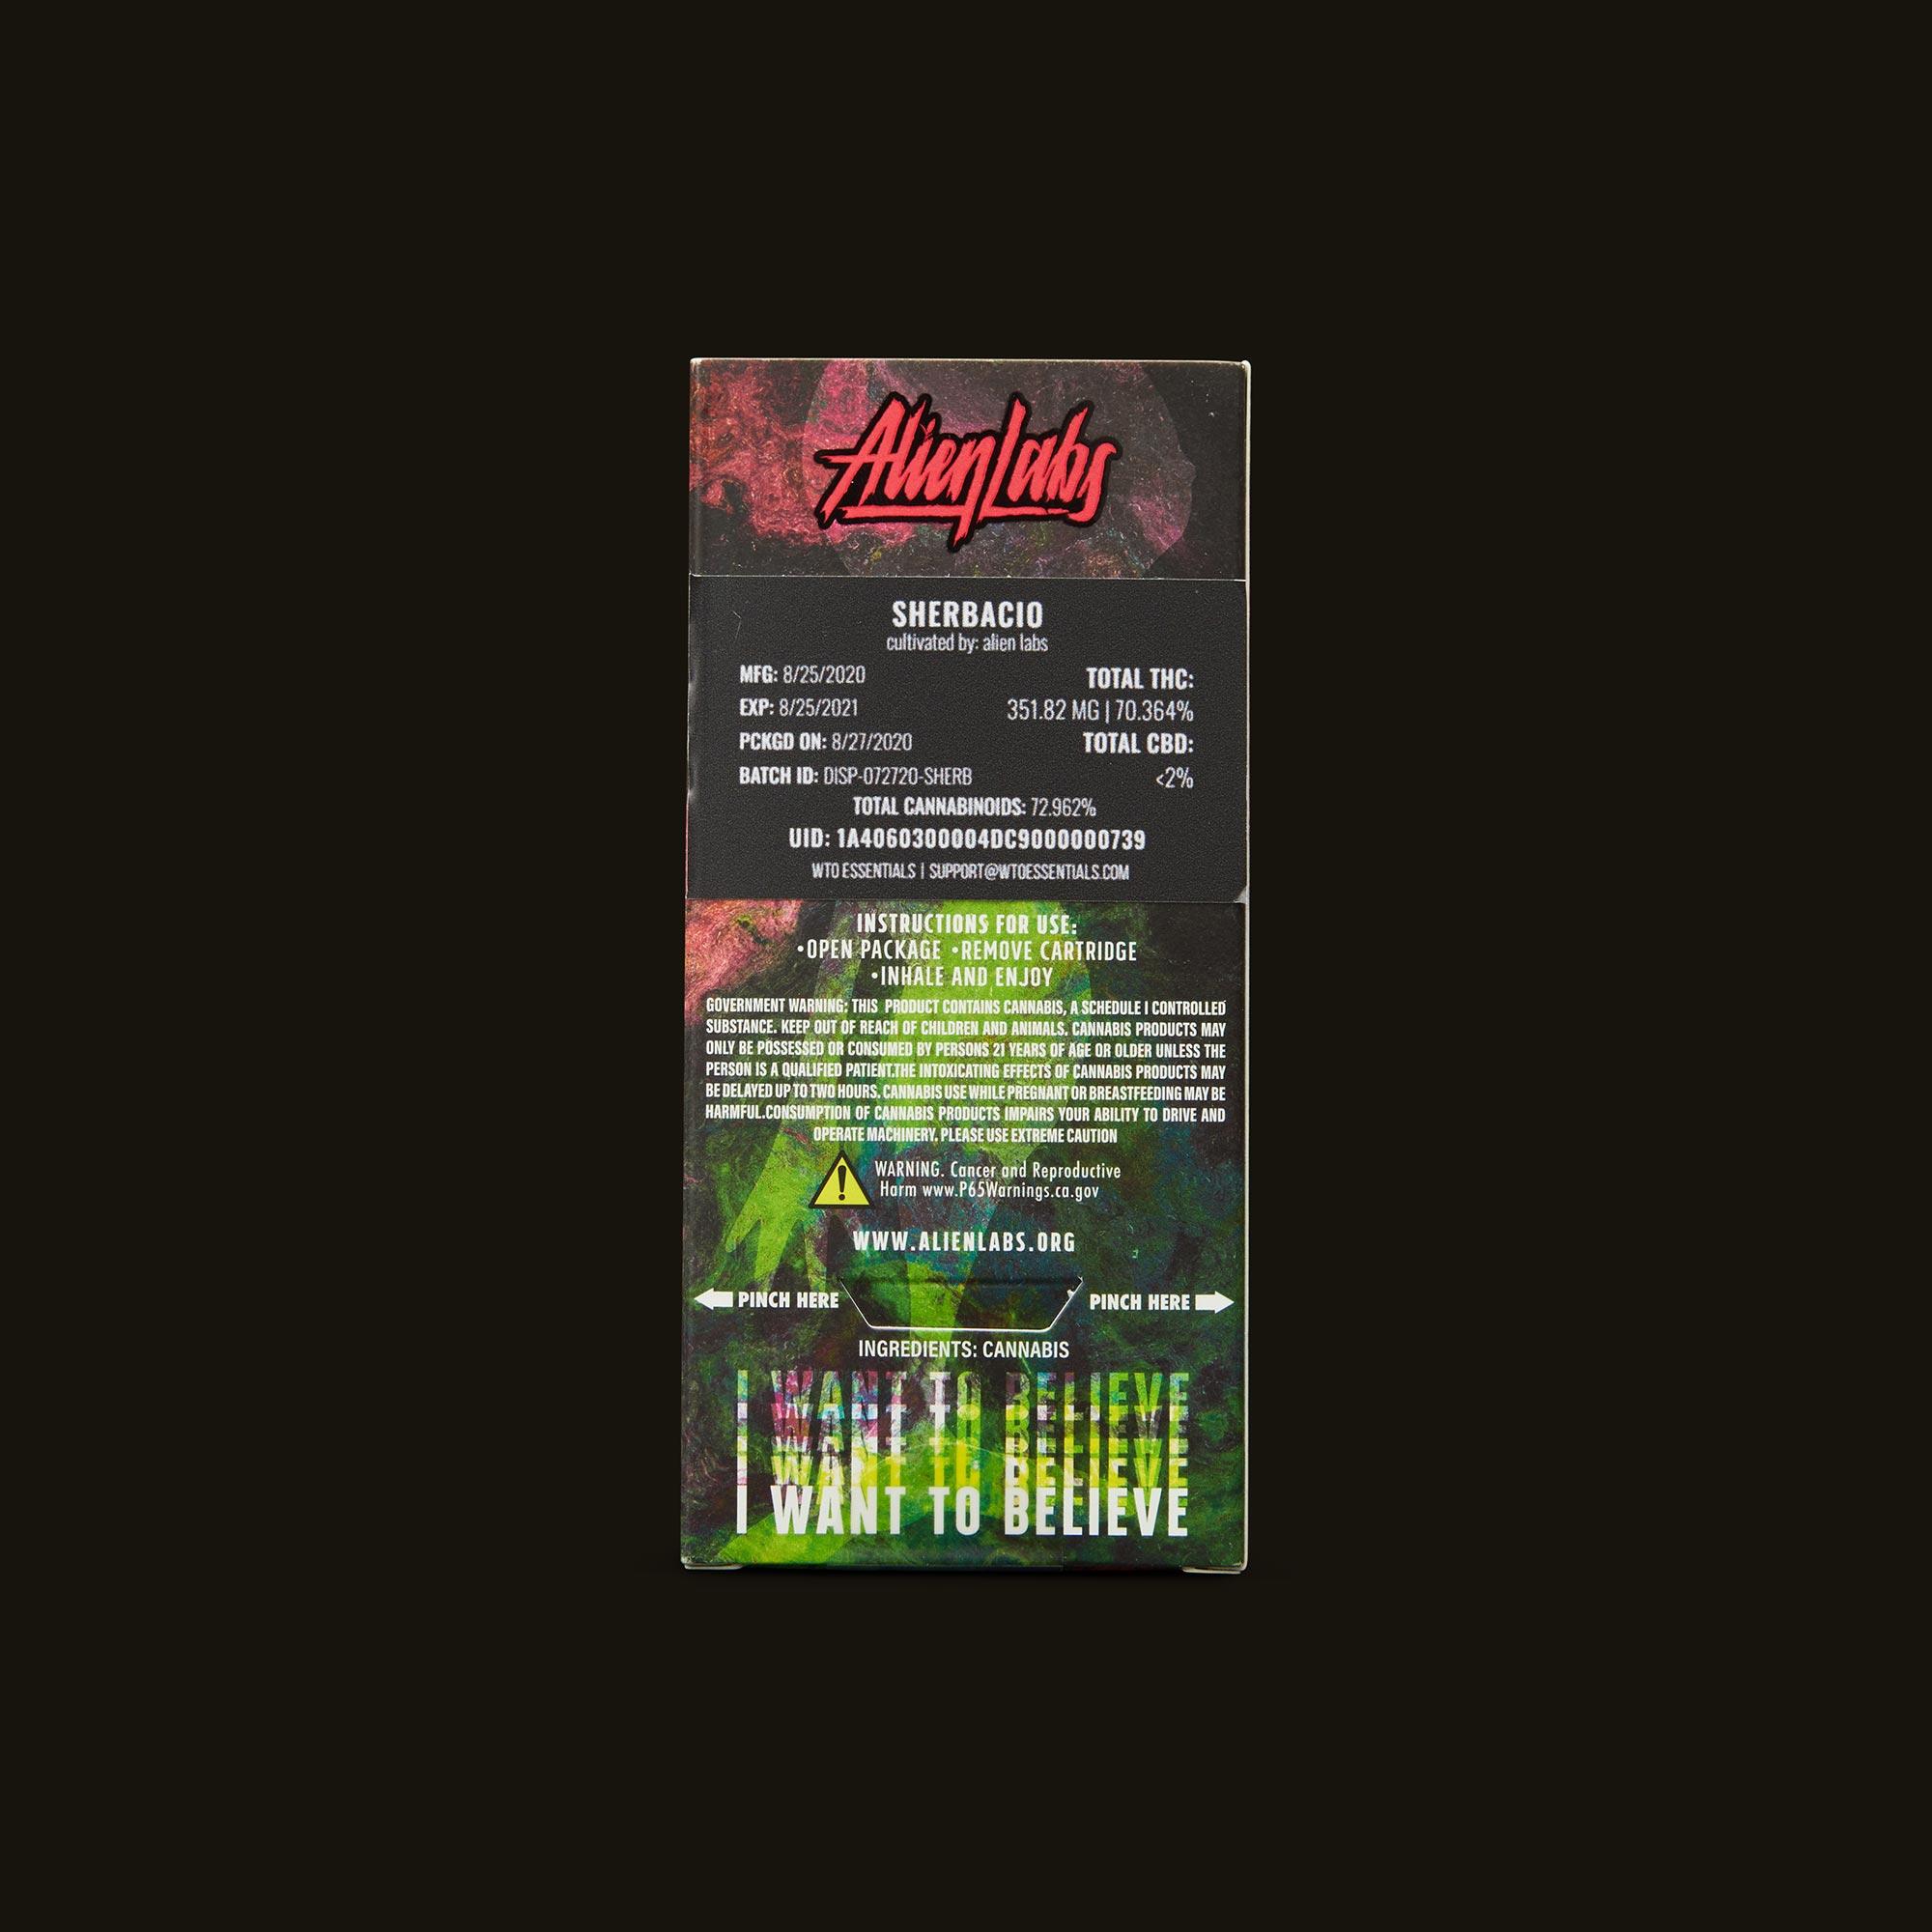 AlienLabs Sherbacio Live Resin Disposable Ingredients